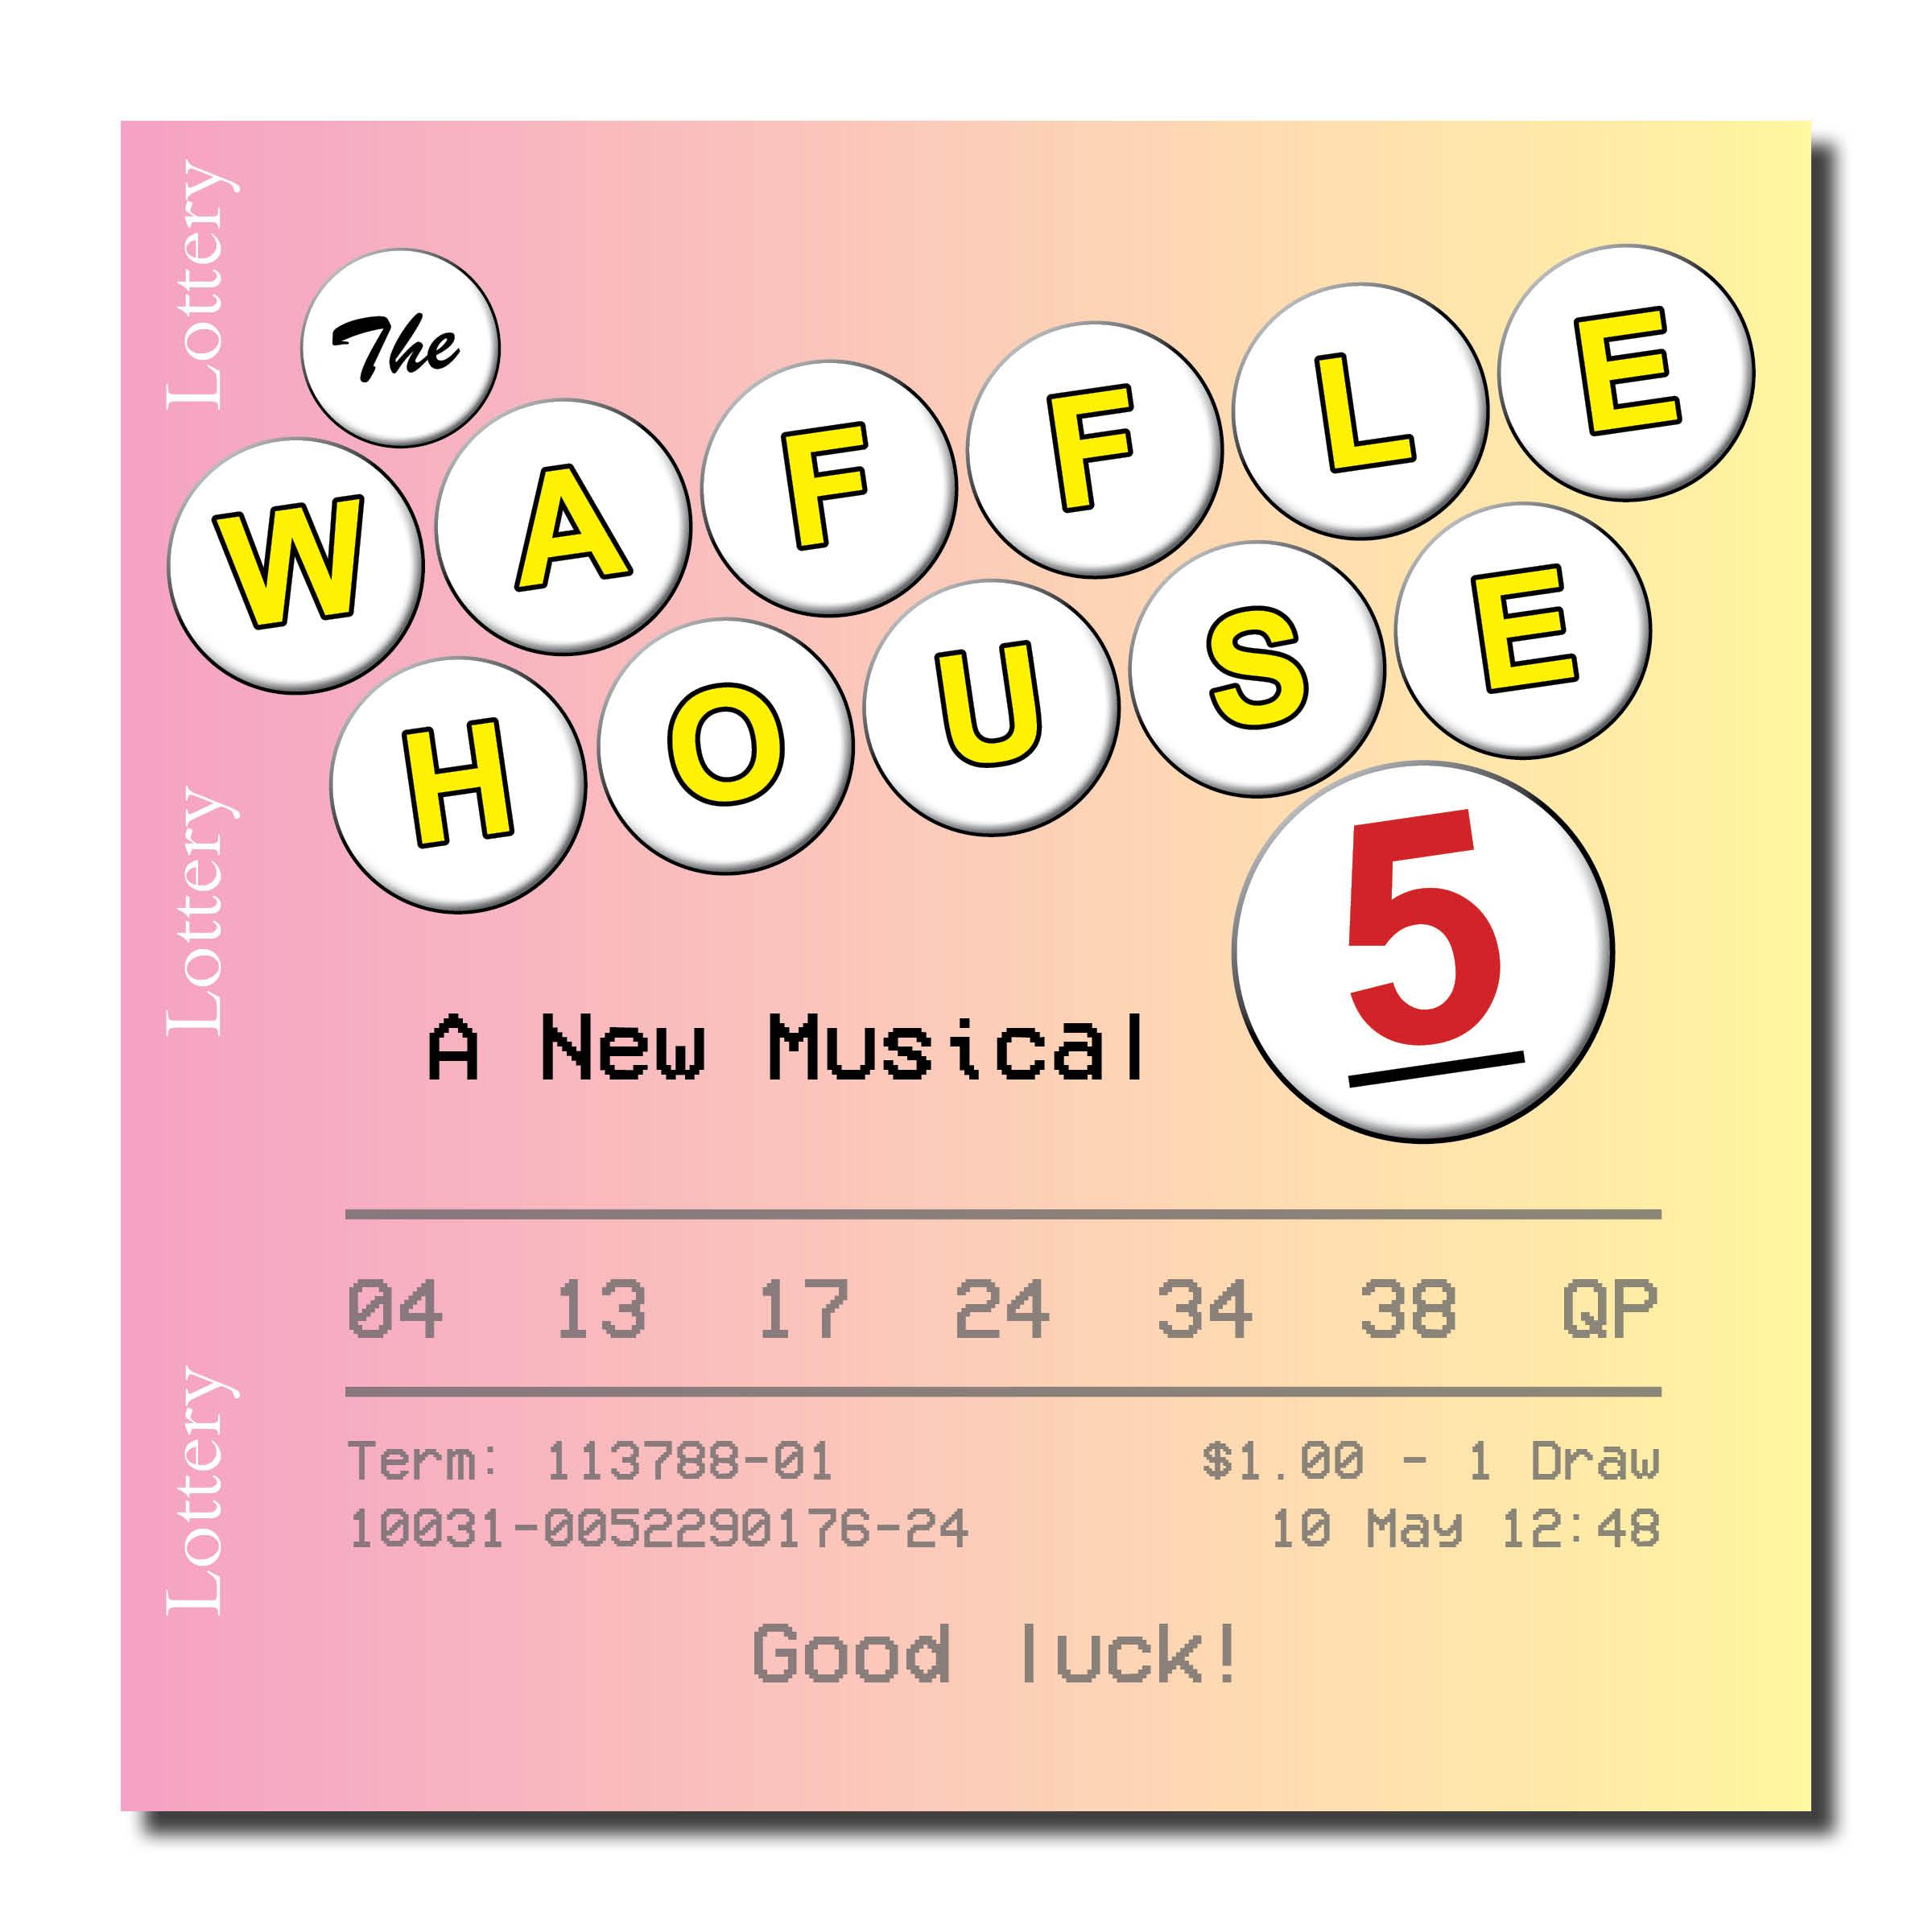 WaffleHouseFive_Logo_A.jpg